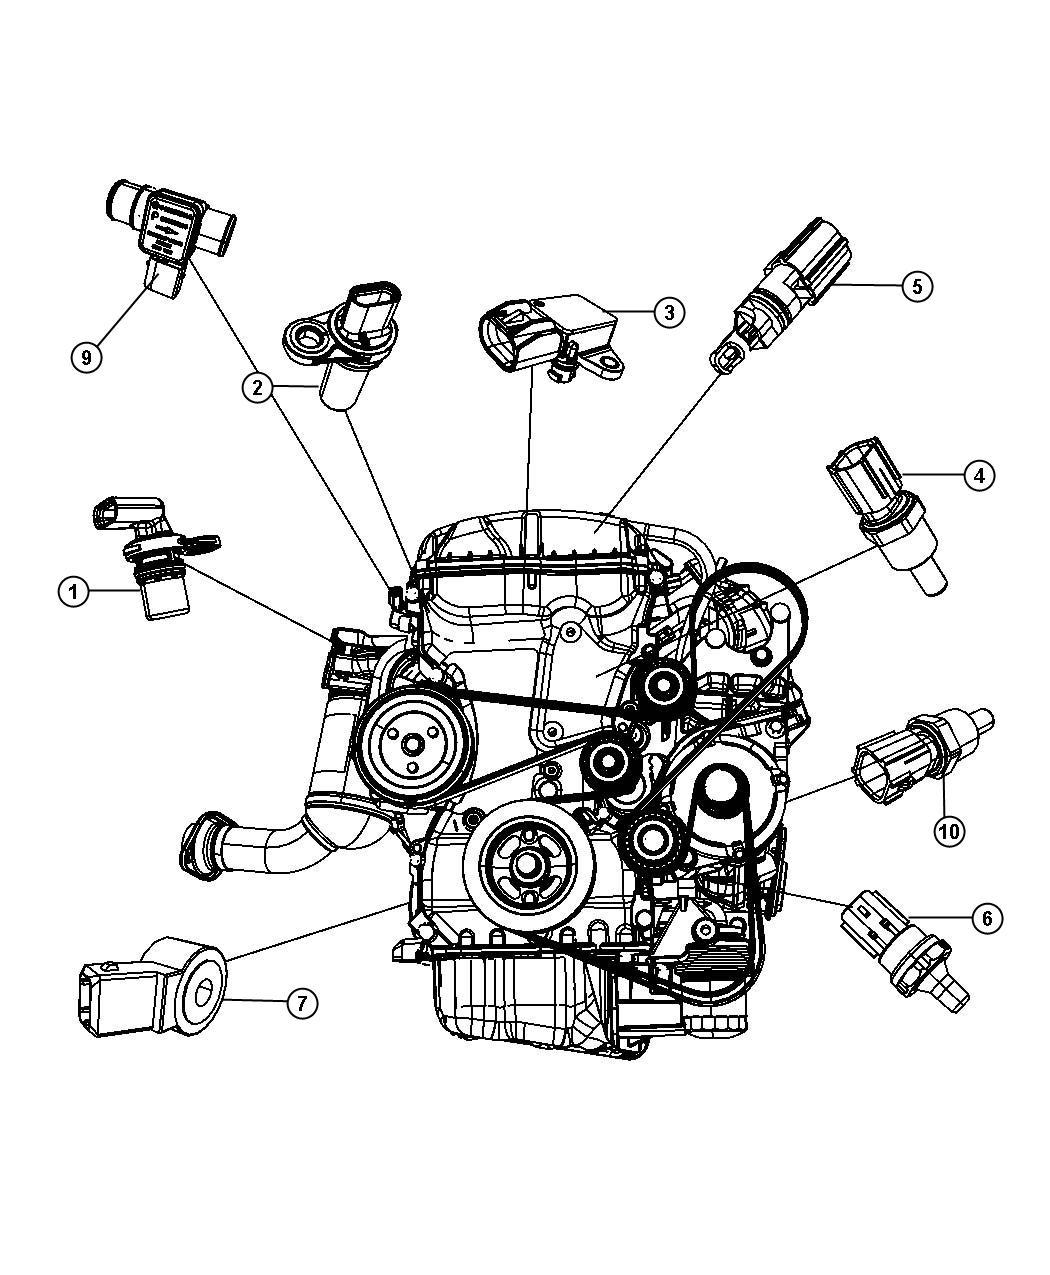 2010 Dodge Avenger Transmission: Sensors, Engine